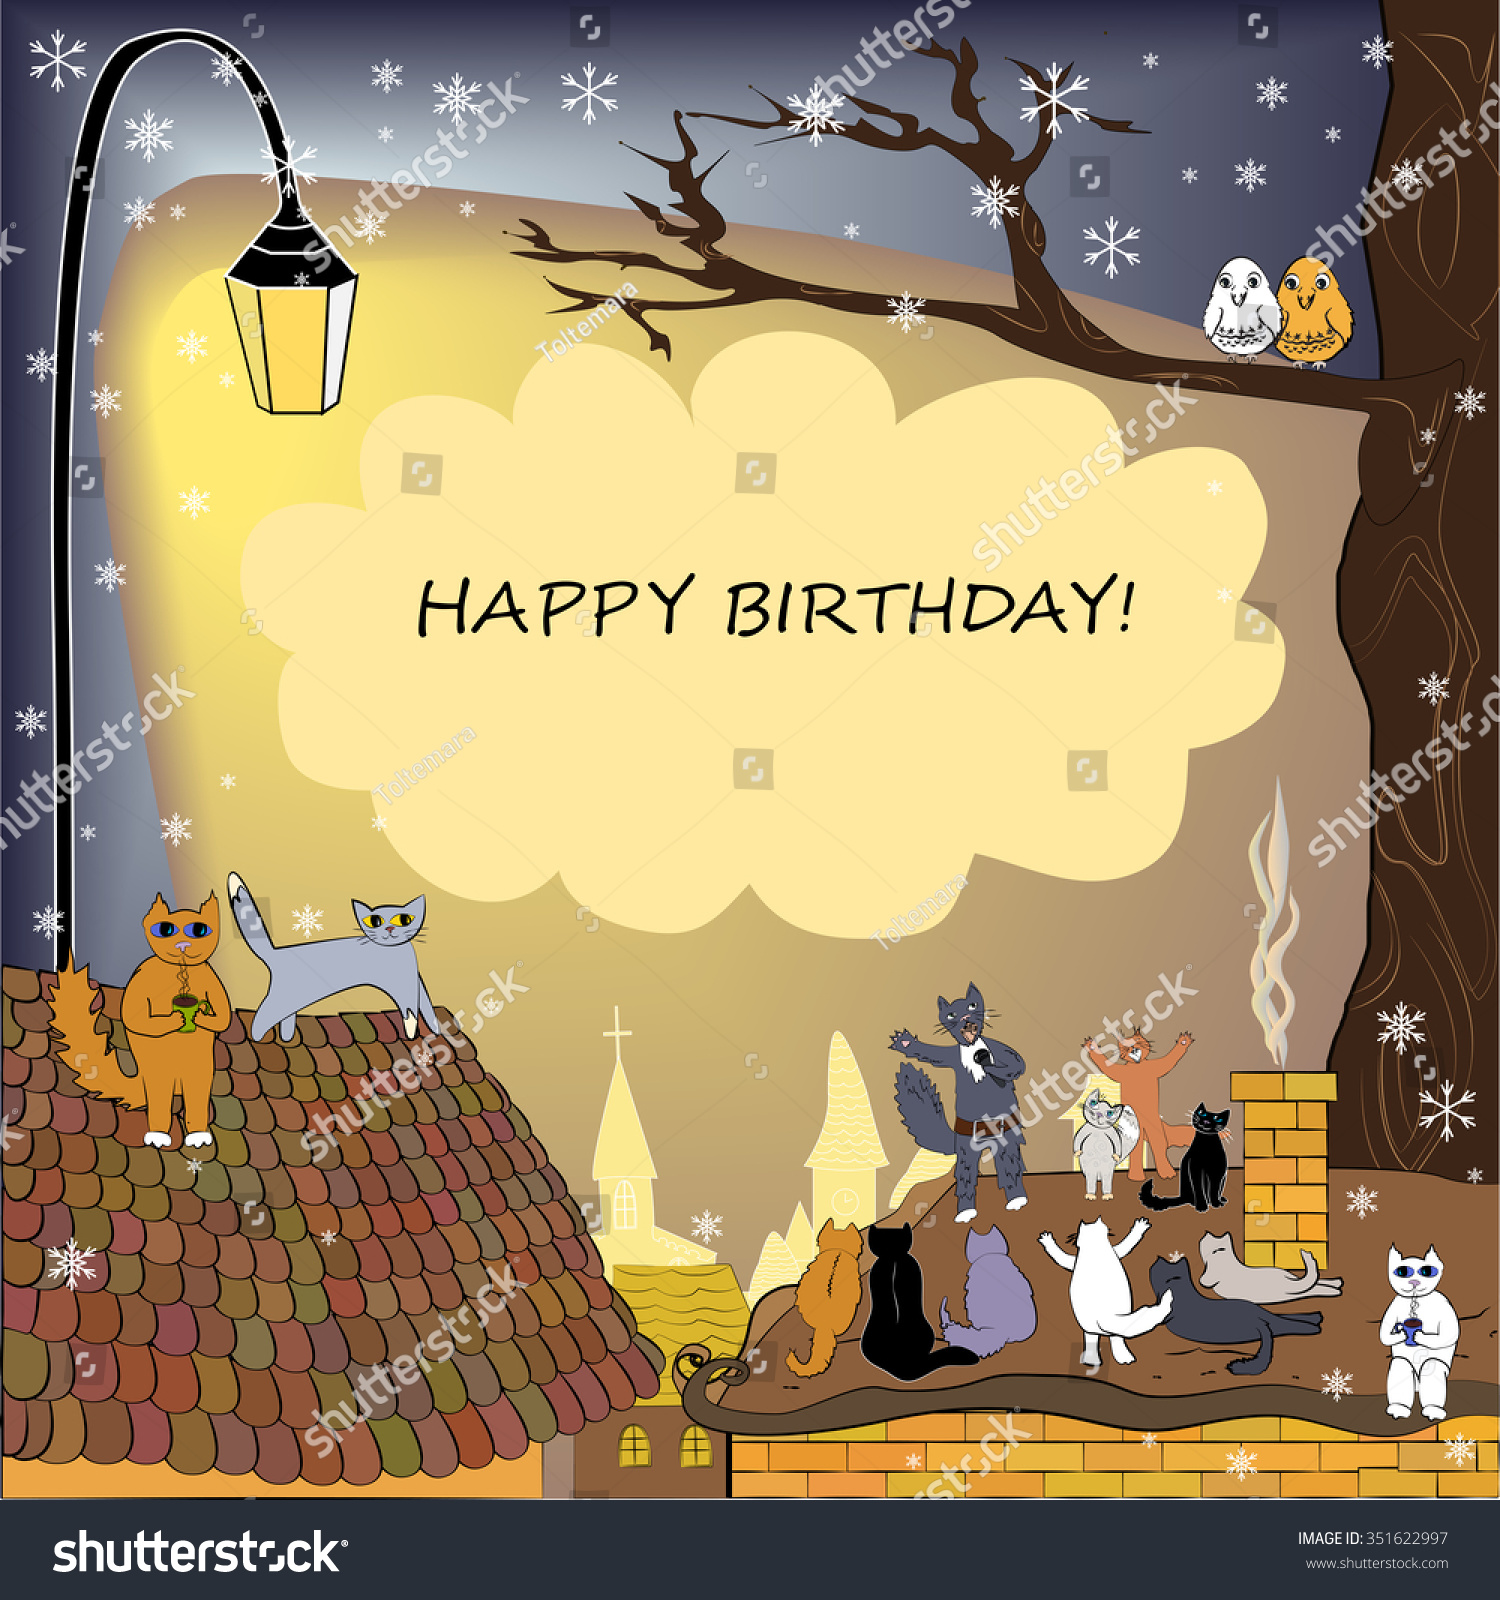 Happy Birthday Card Winter Frame Cats Stock Vector Royalty Free 351622997